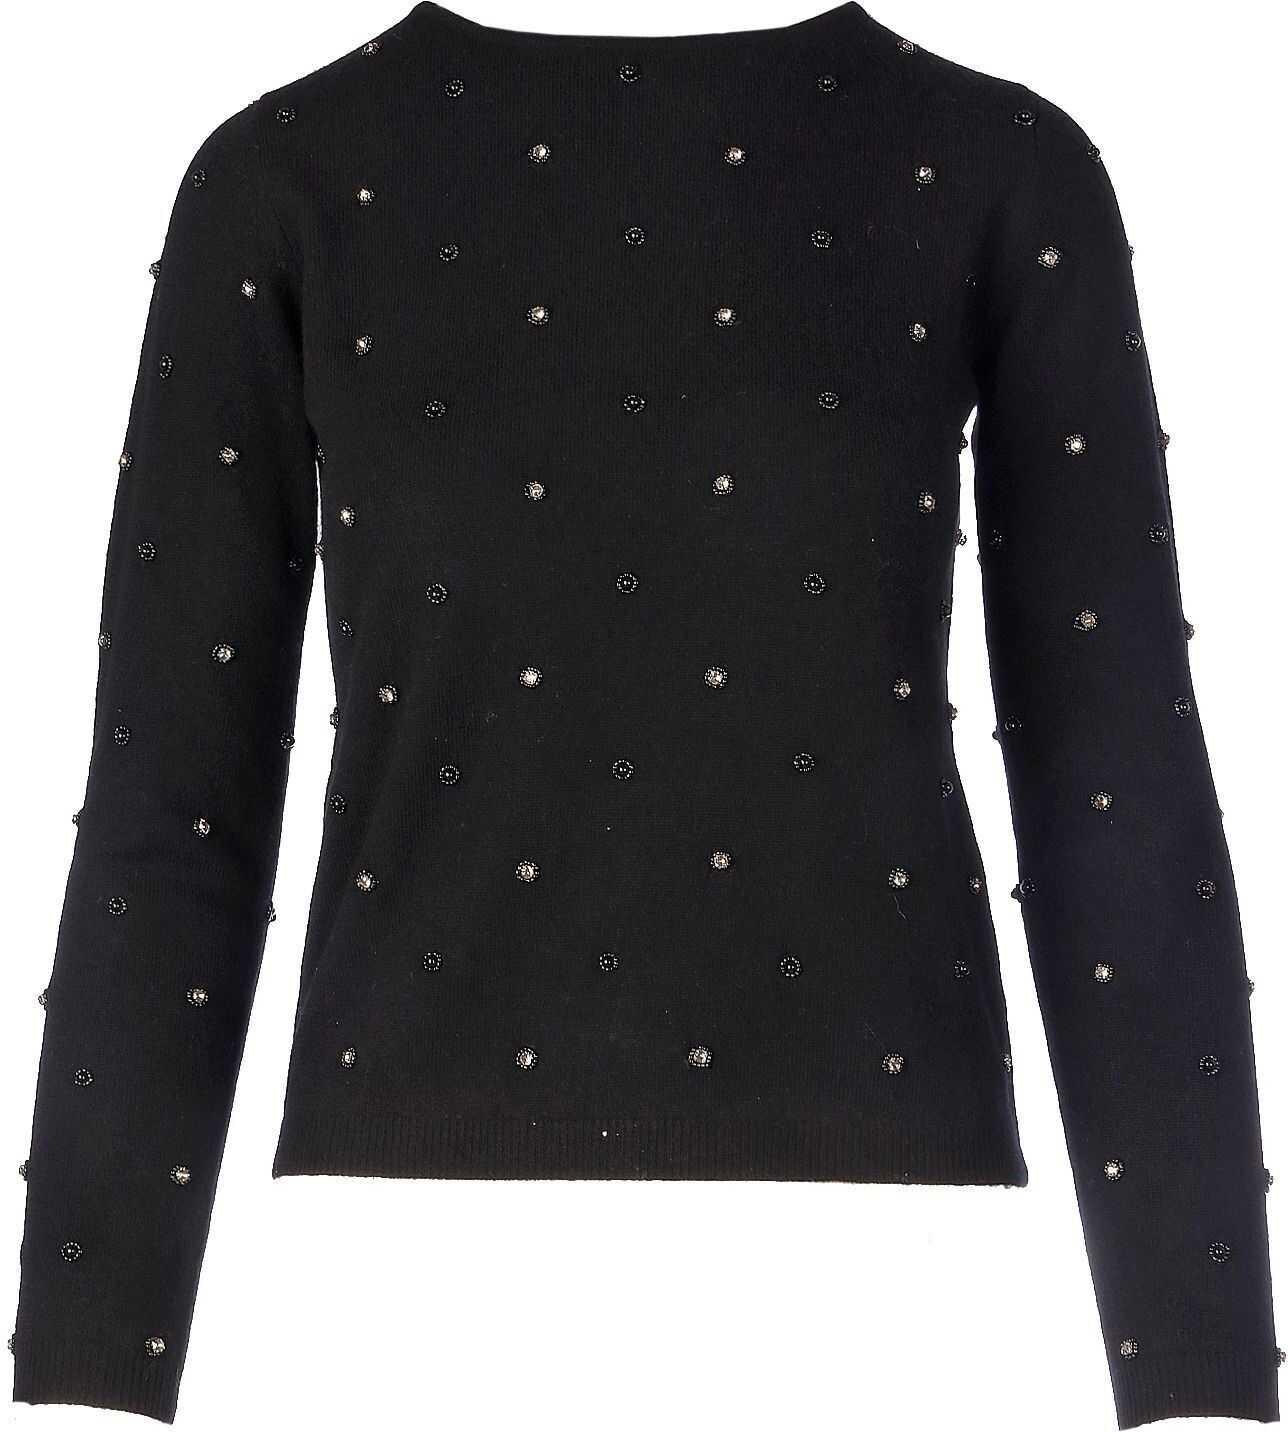 Moschino Wool Sweater BLACK